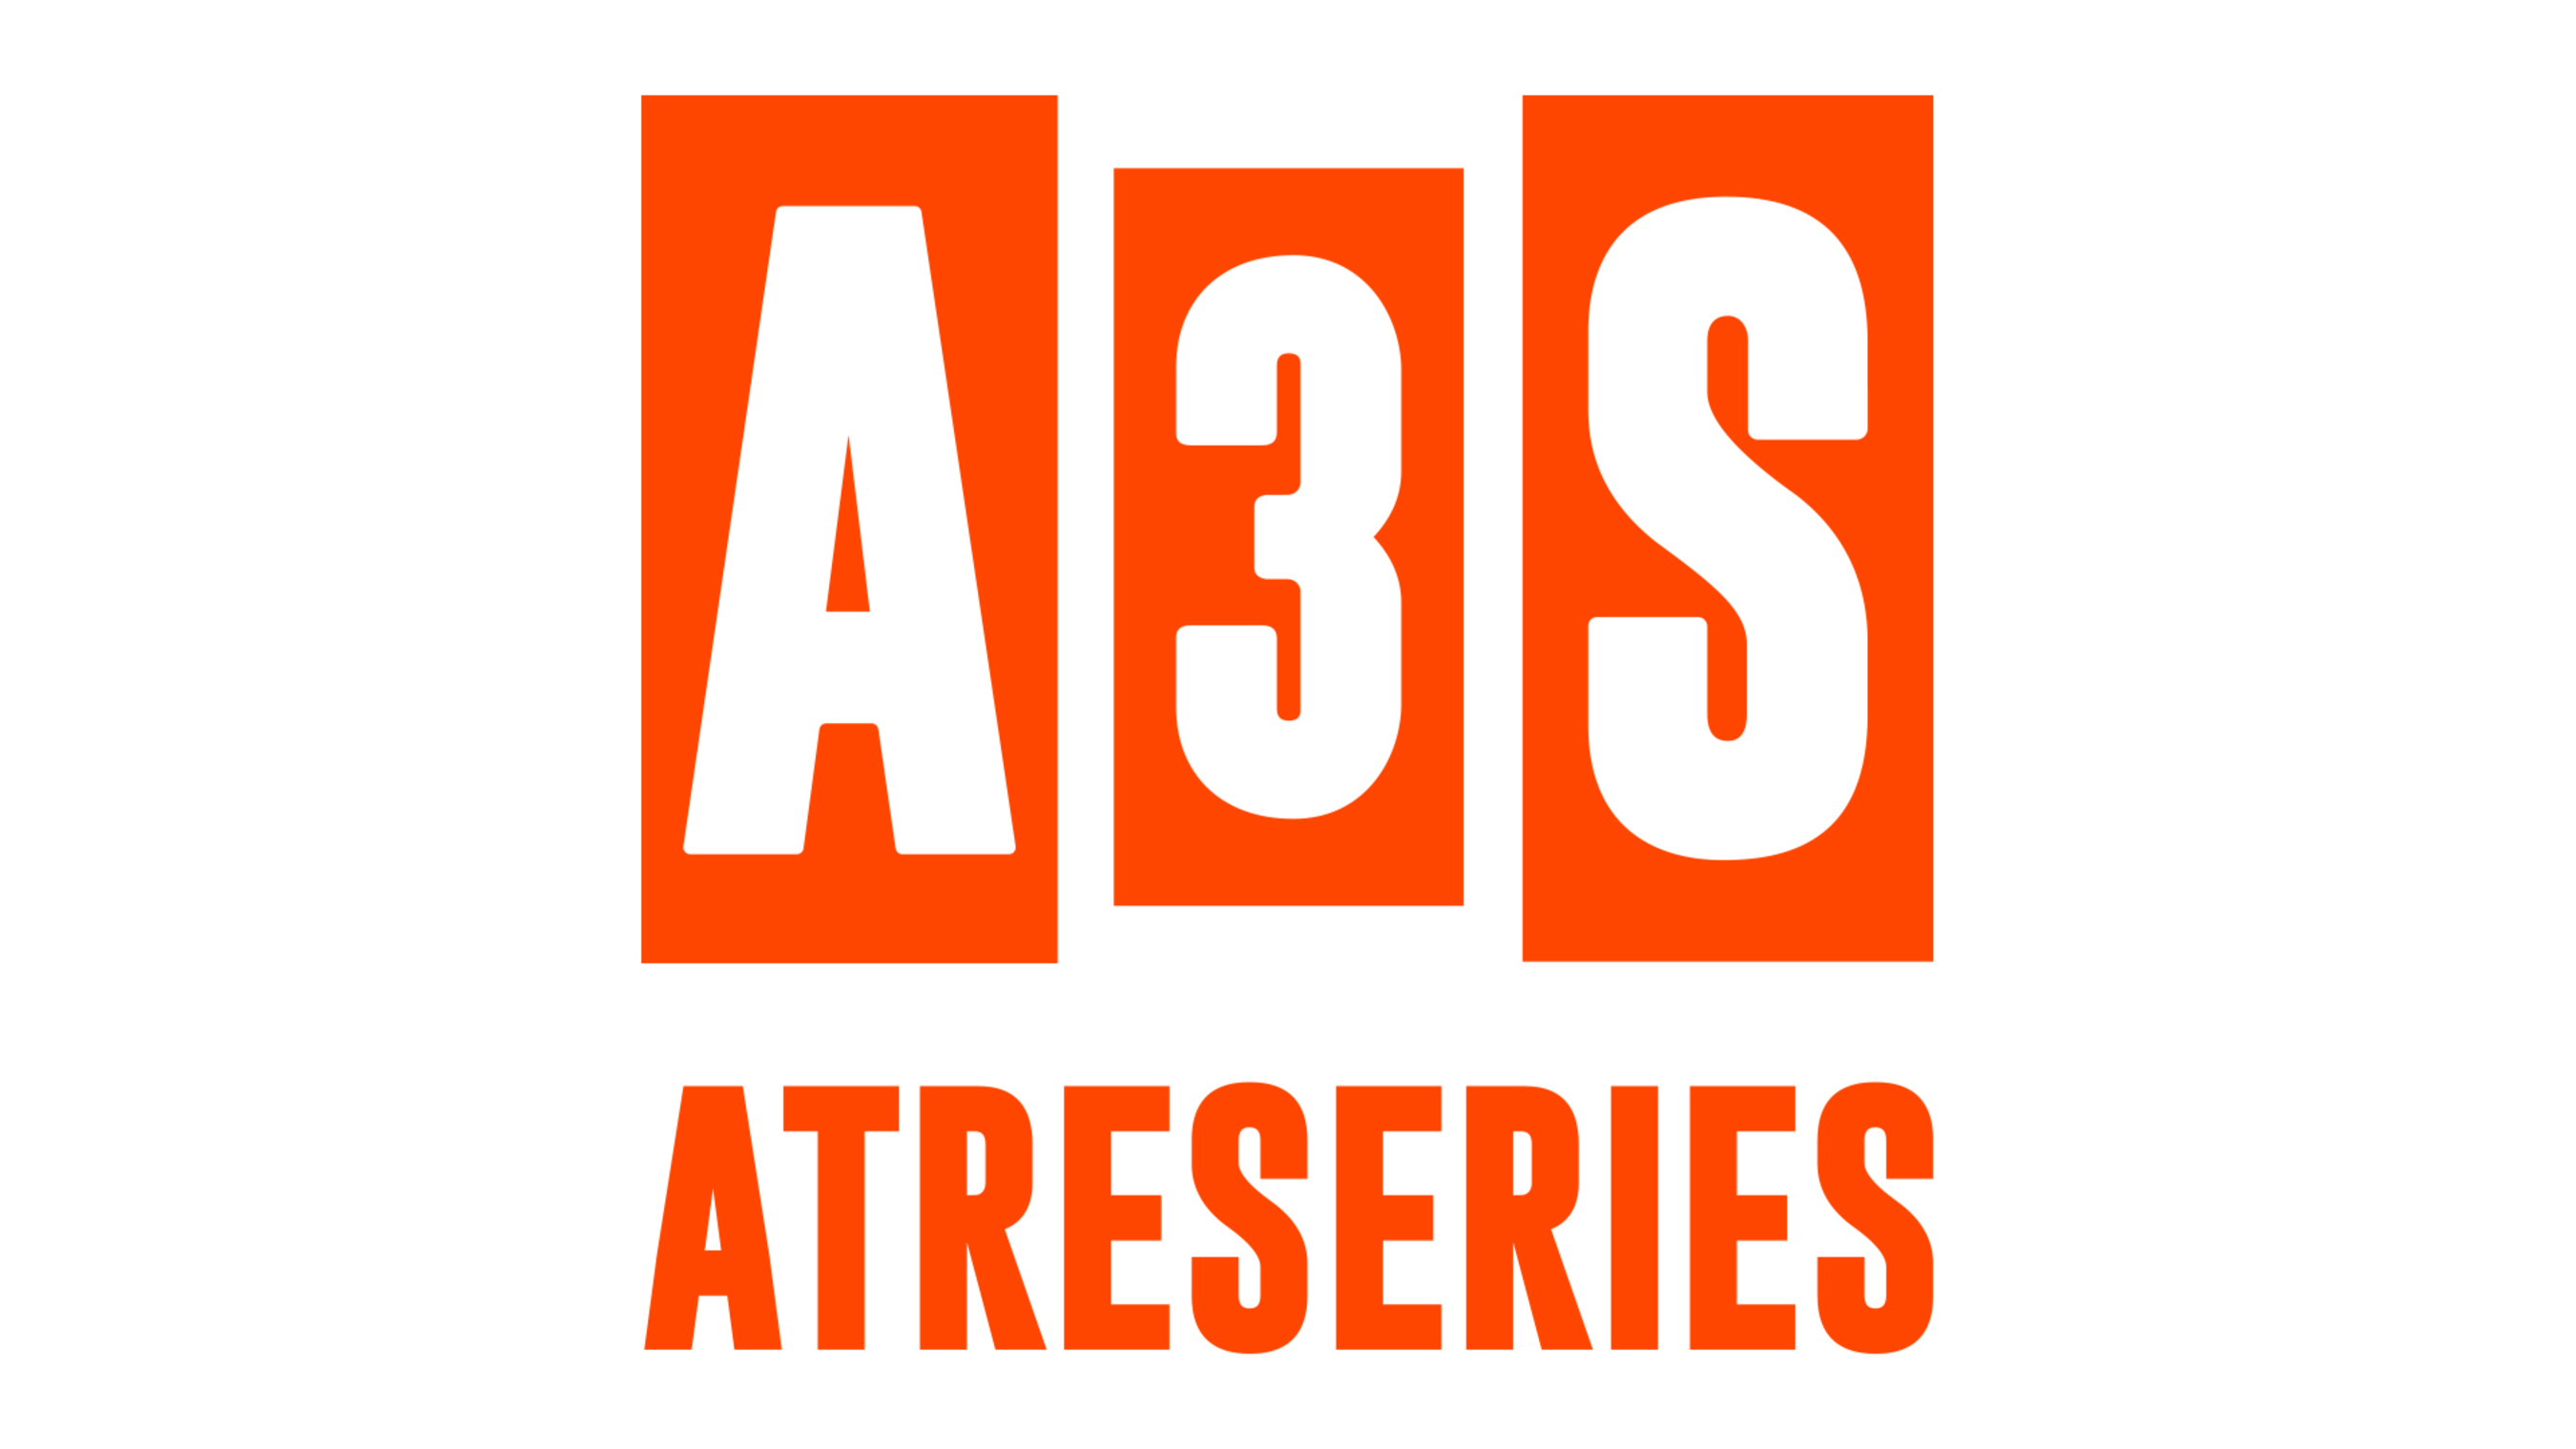 ATRES SERIES Launches on DIRECTV Mas Platform